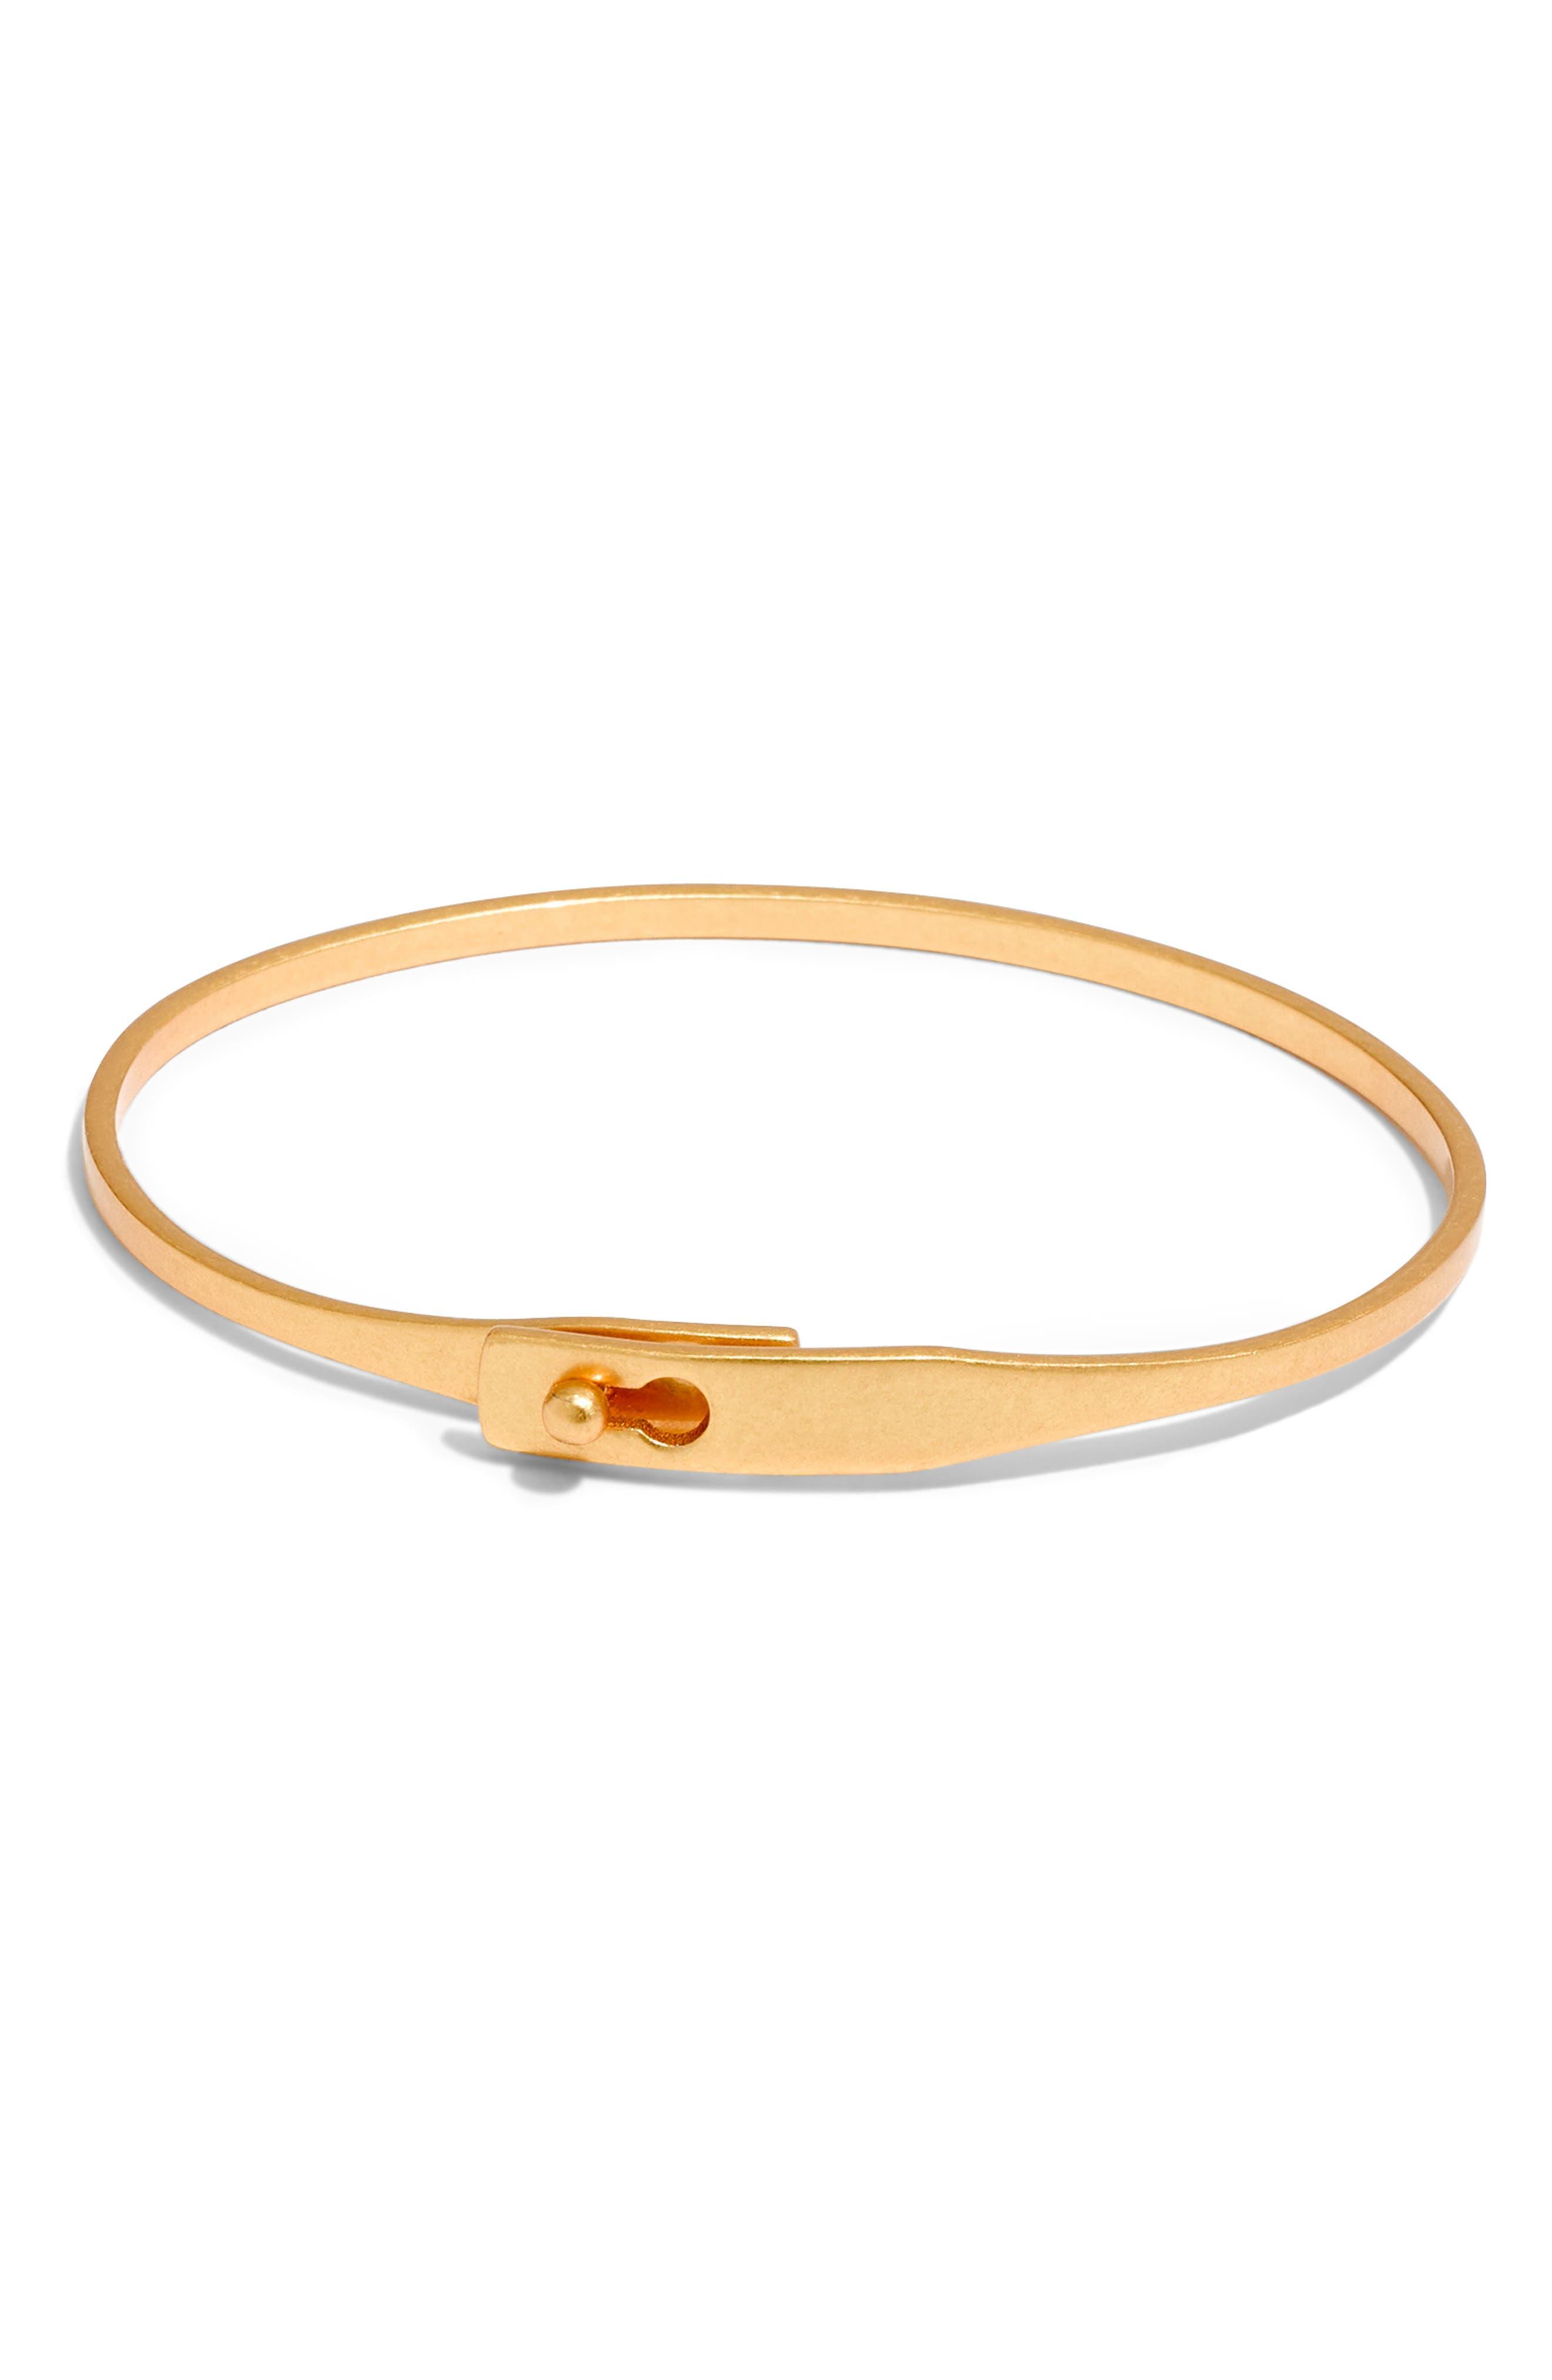 MADEWELL, Delicate Glider Bangle Bracelet, Main thumbnail 1, color, VINTAGE GOLD